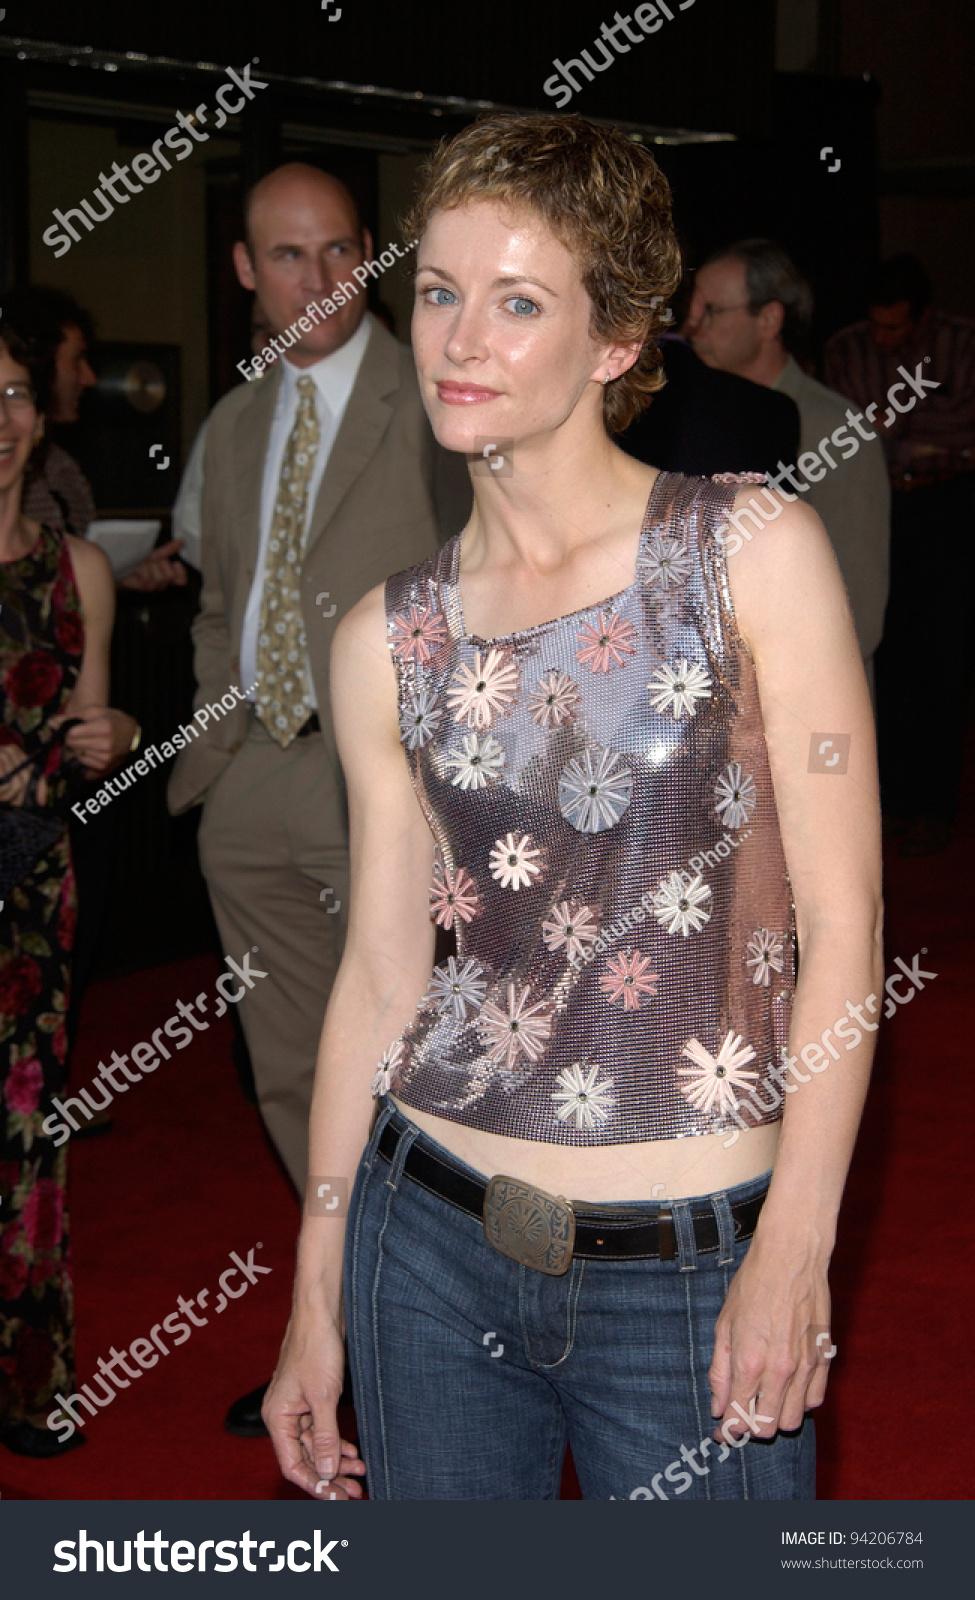 Lauryn Goodman, Amelia Goodman, Chloe Goodman Hot